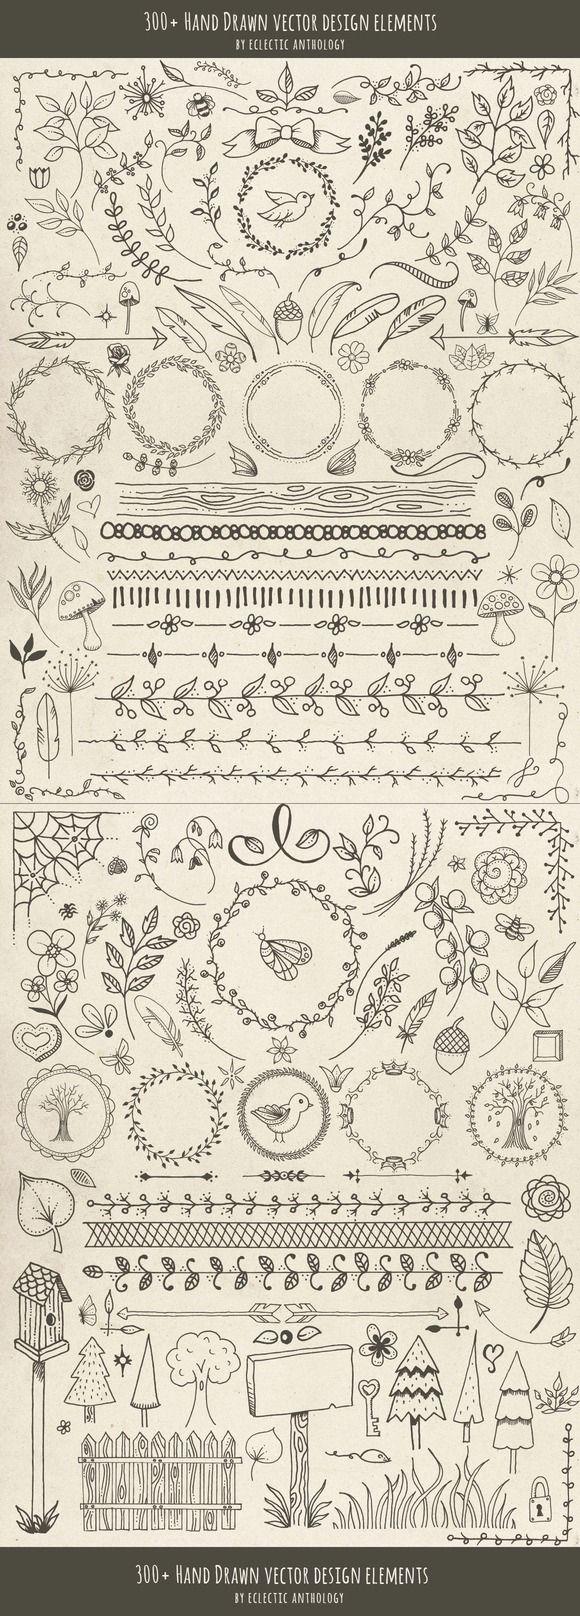 best art journal design elements images on pinterest doodles